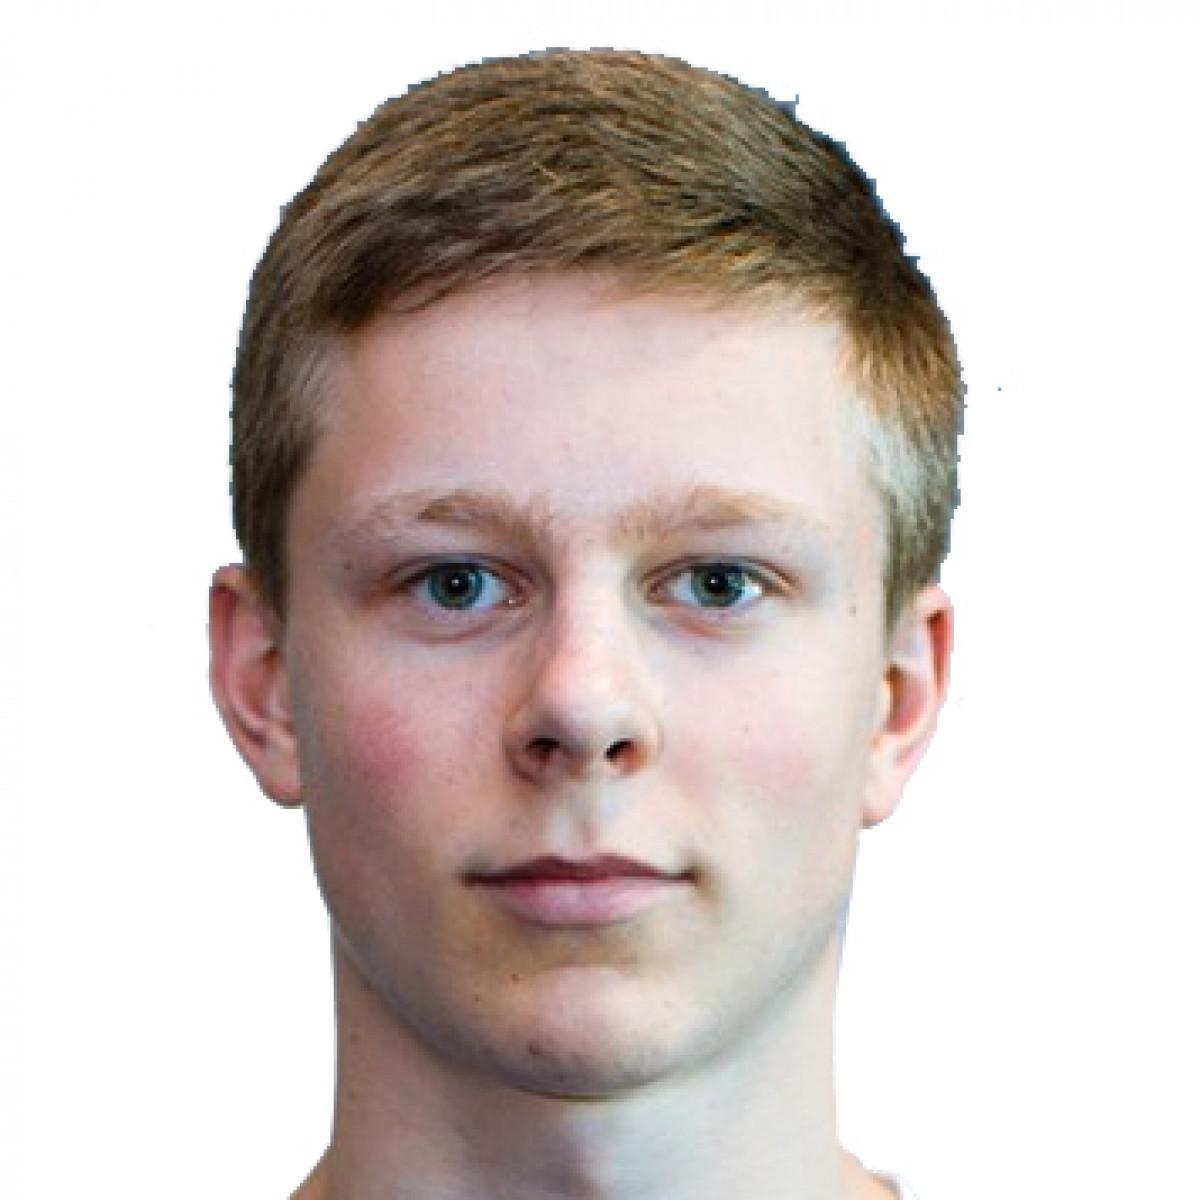 Hjortur Kristjansson